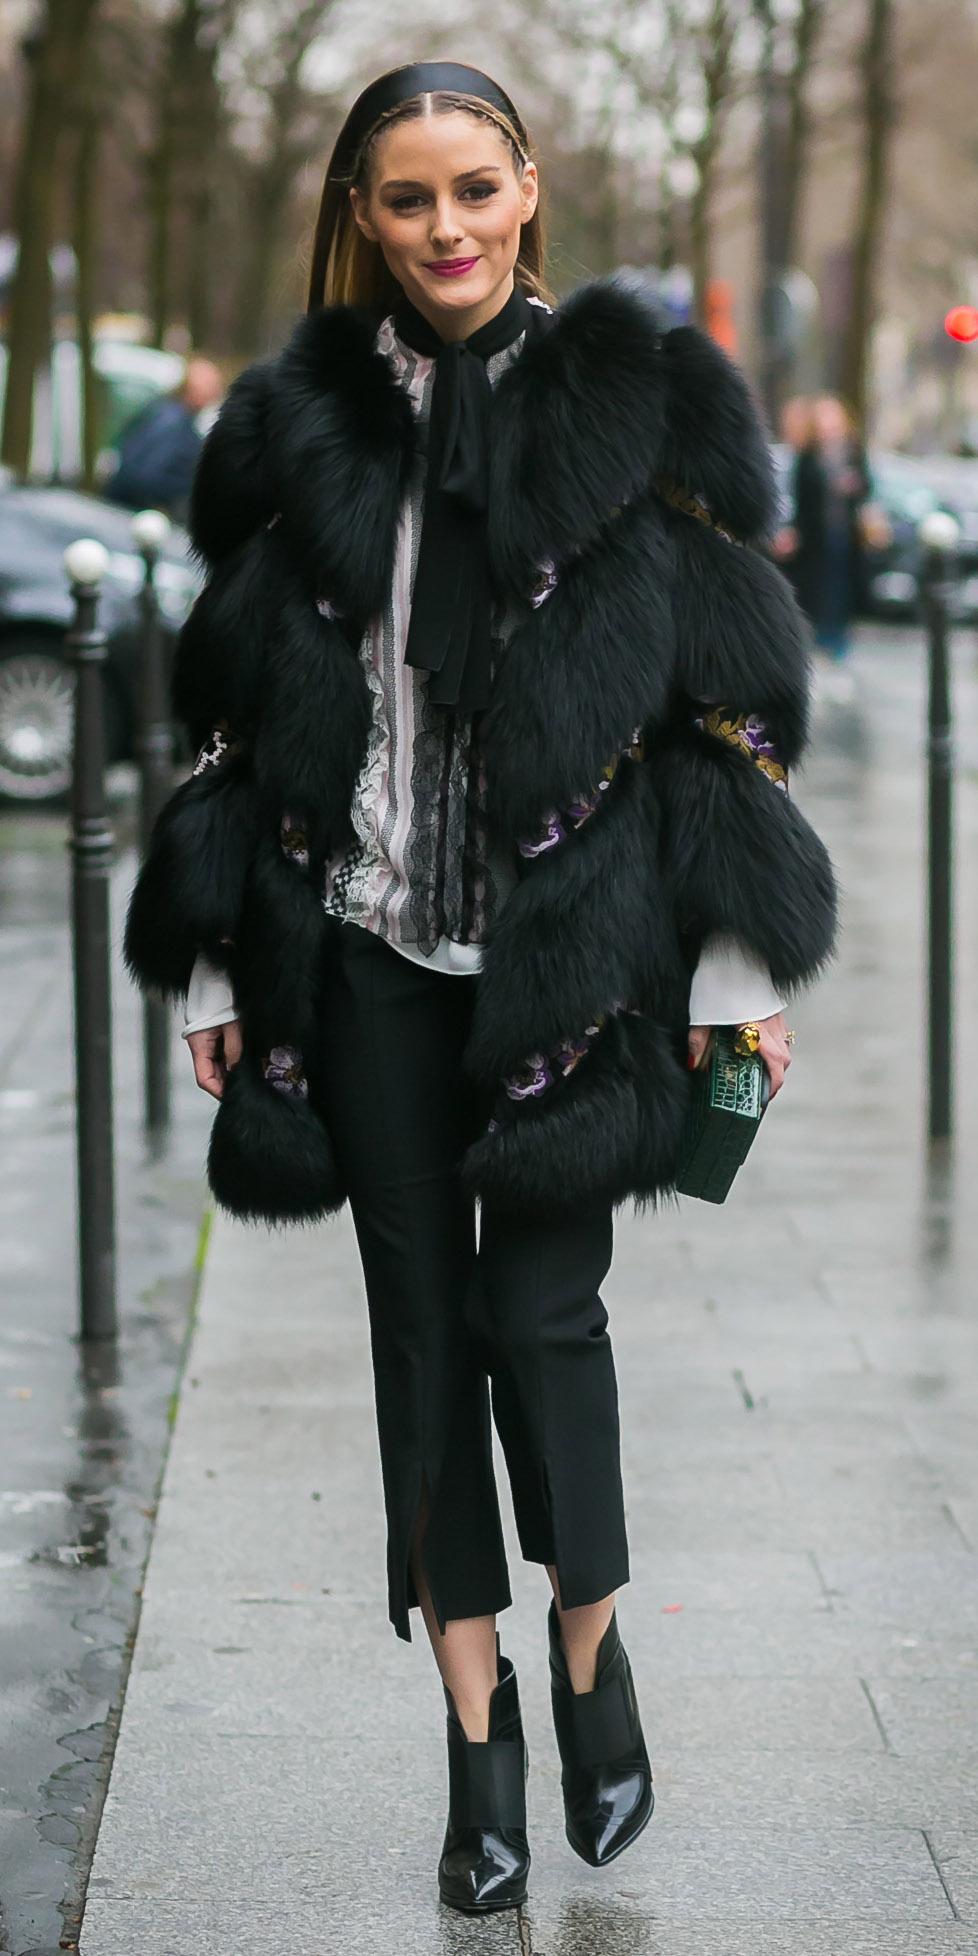 black-slim-pants-white-top-blouse-head-black-shoe-booties-oliviapalermo-black-jacket-coat-fur-fuzz-fall-winter-hairr-lunch.jpg